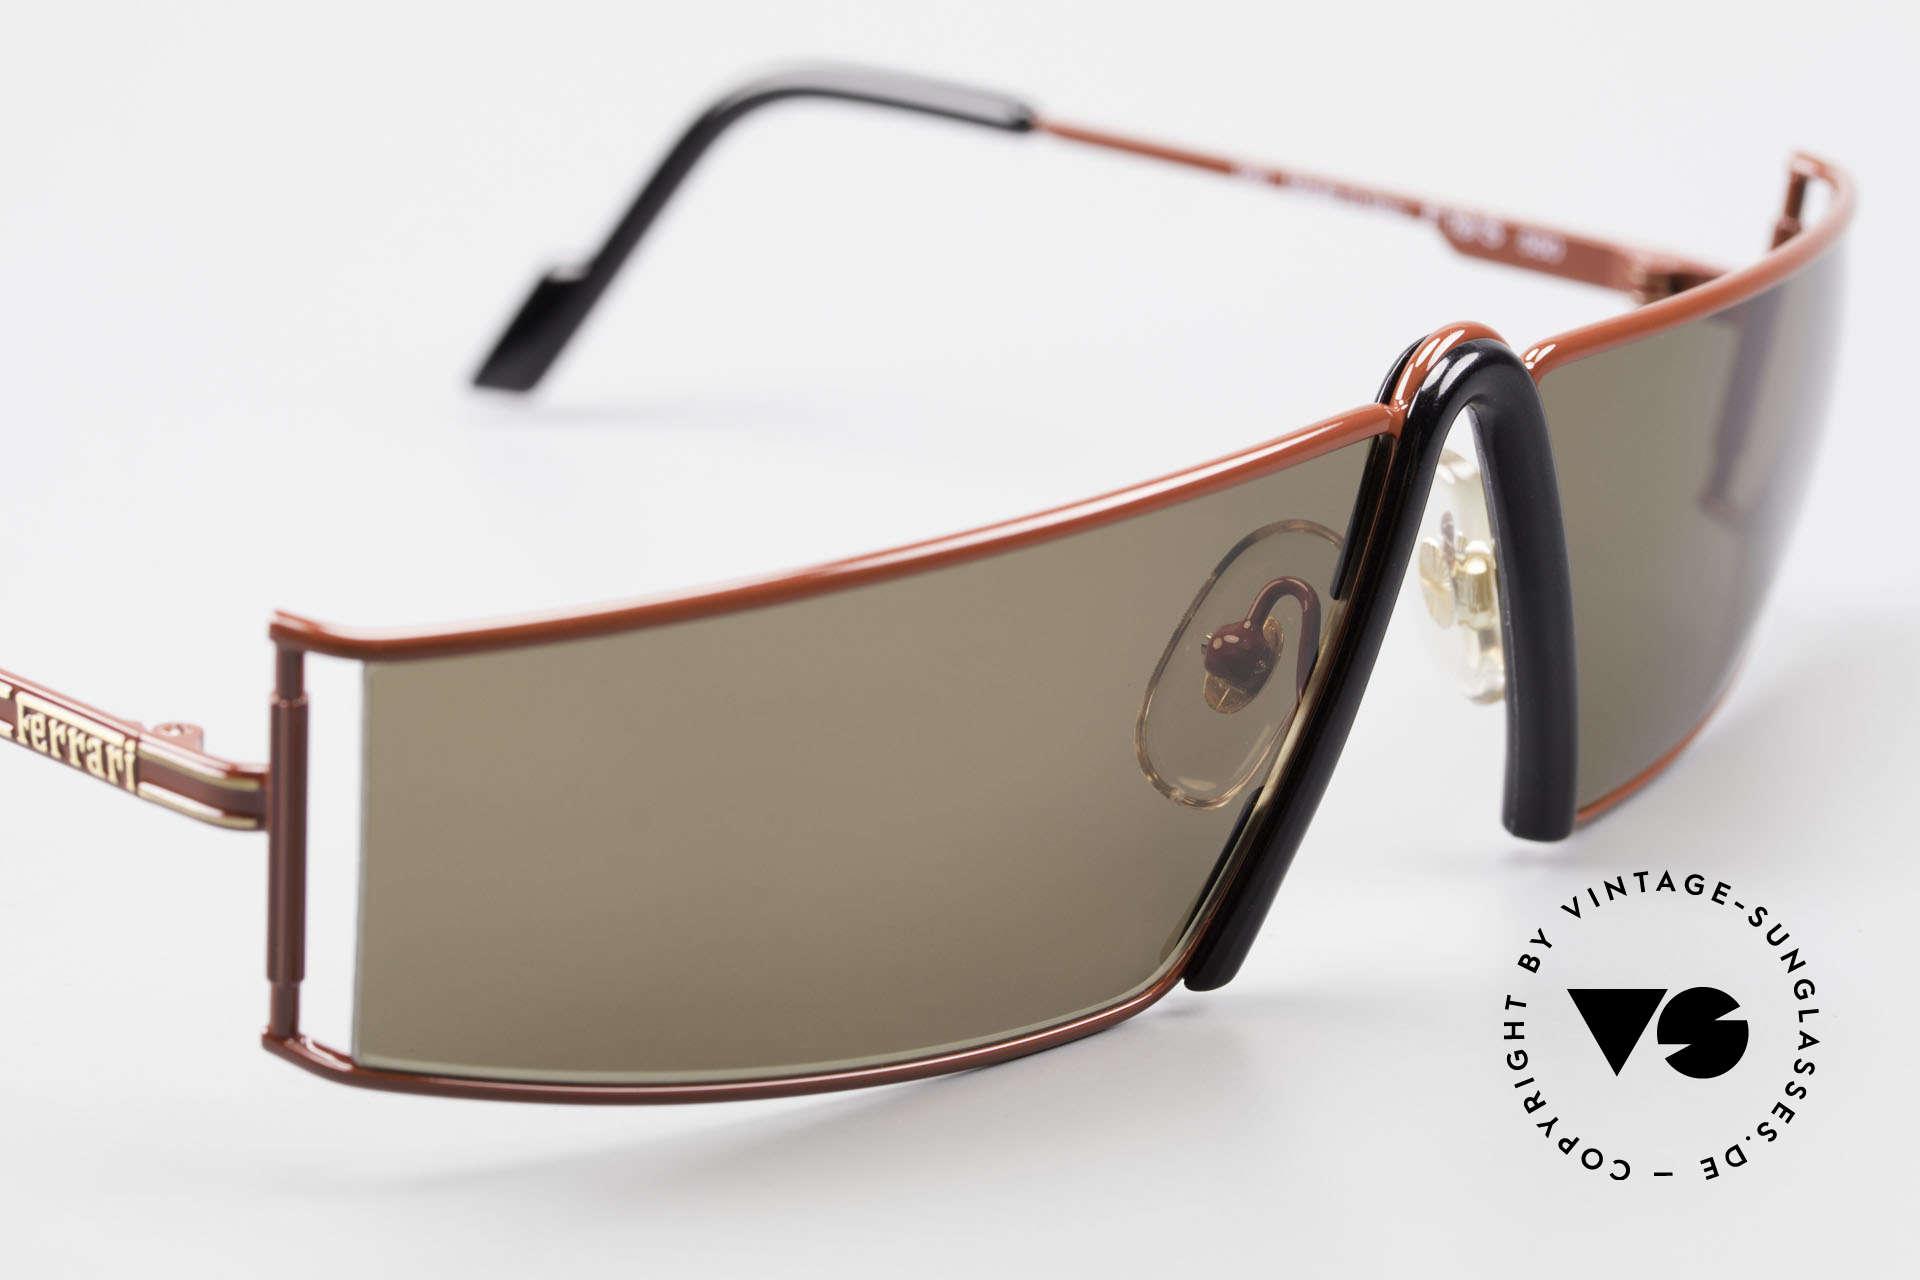 Ferrari F19/S Shades Like XL Reading Glasses, never worn (like all our rare vintage Ferrari shades), Made for Men